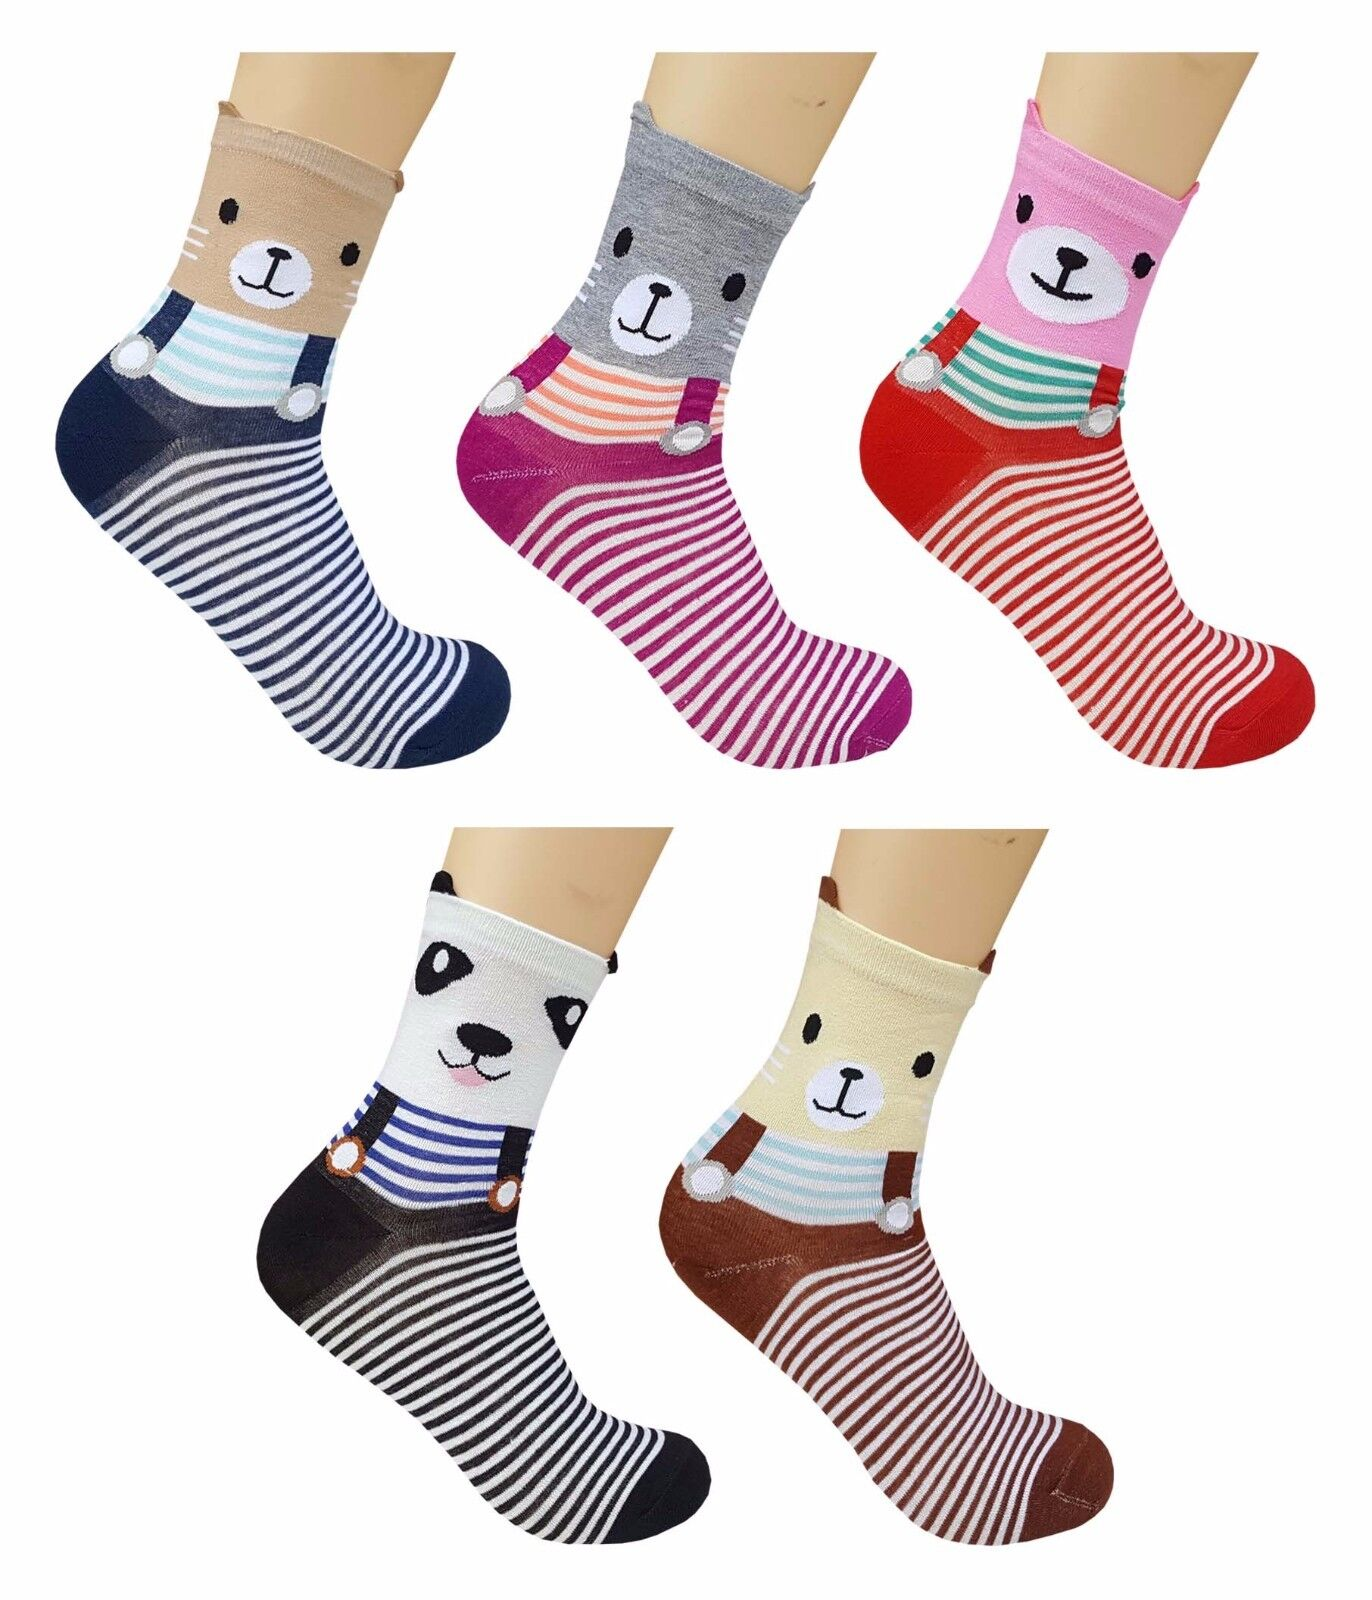 BLUE REEF Socken Damen Süß Schwein Bär Hund Spaß Neuheit Knöchel Socken 2-5